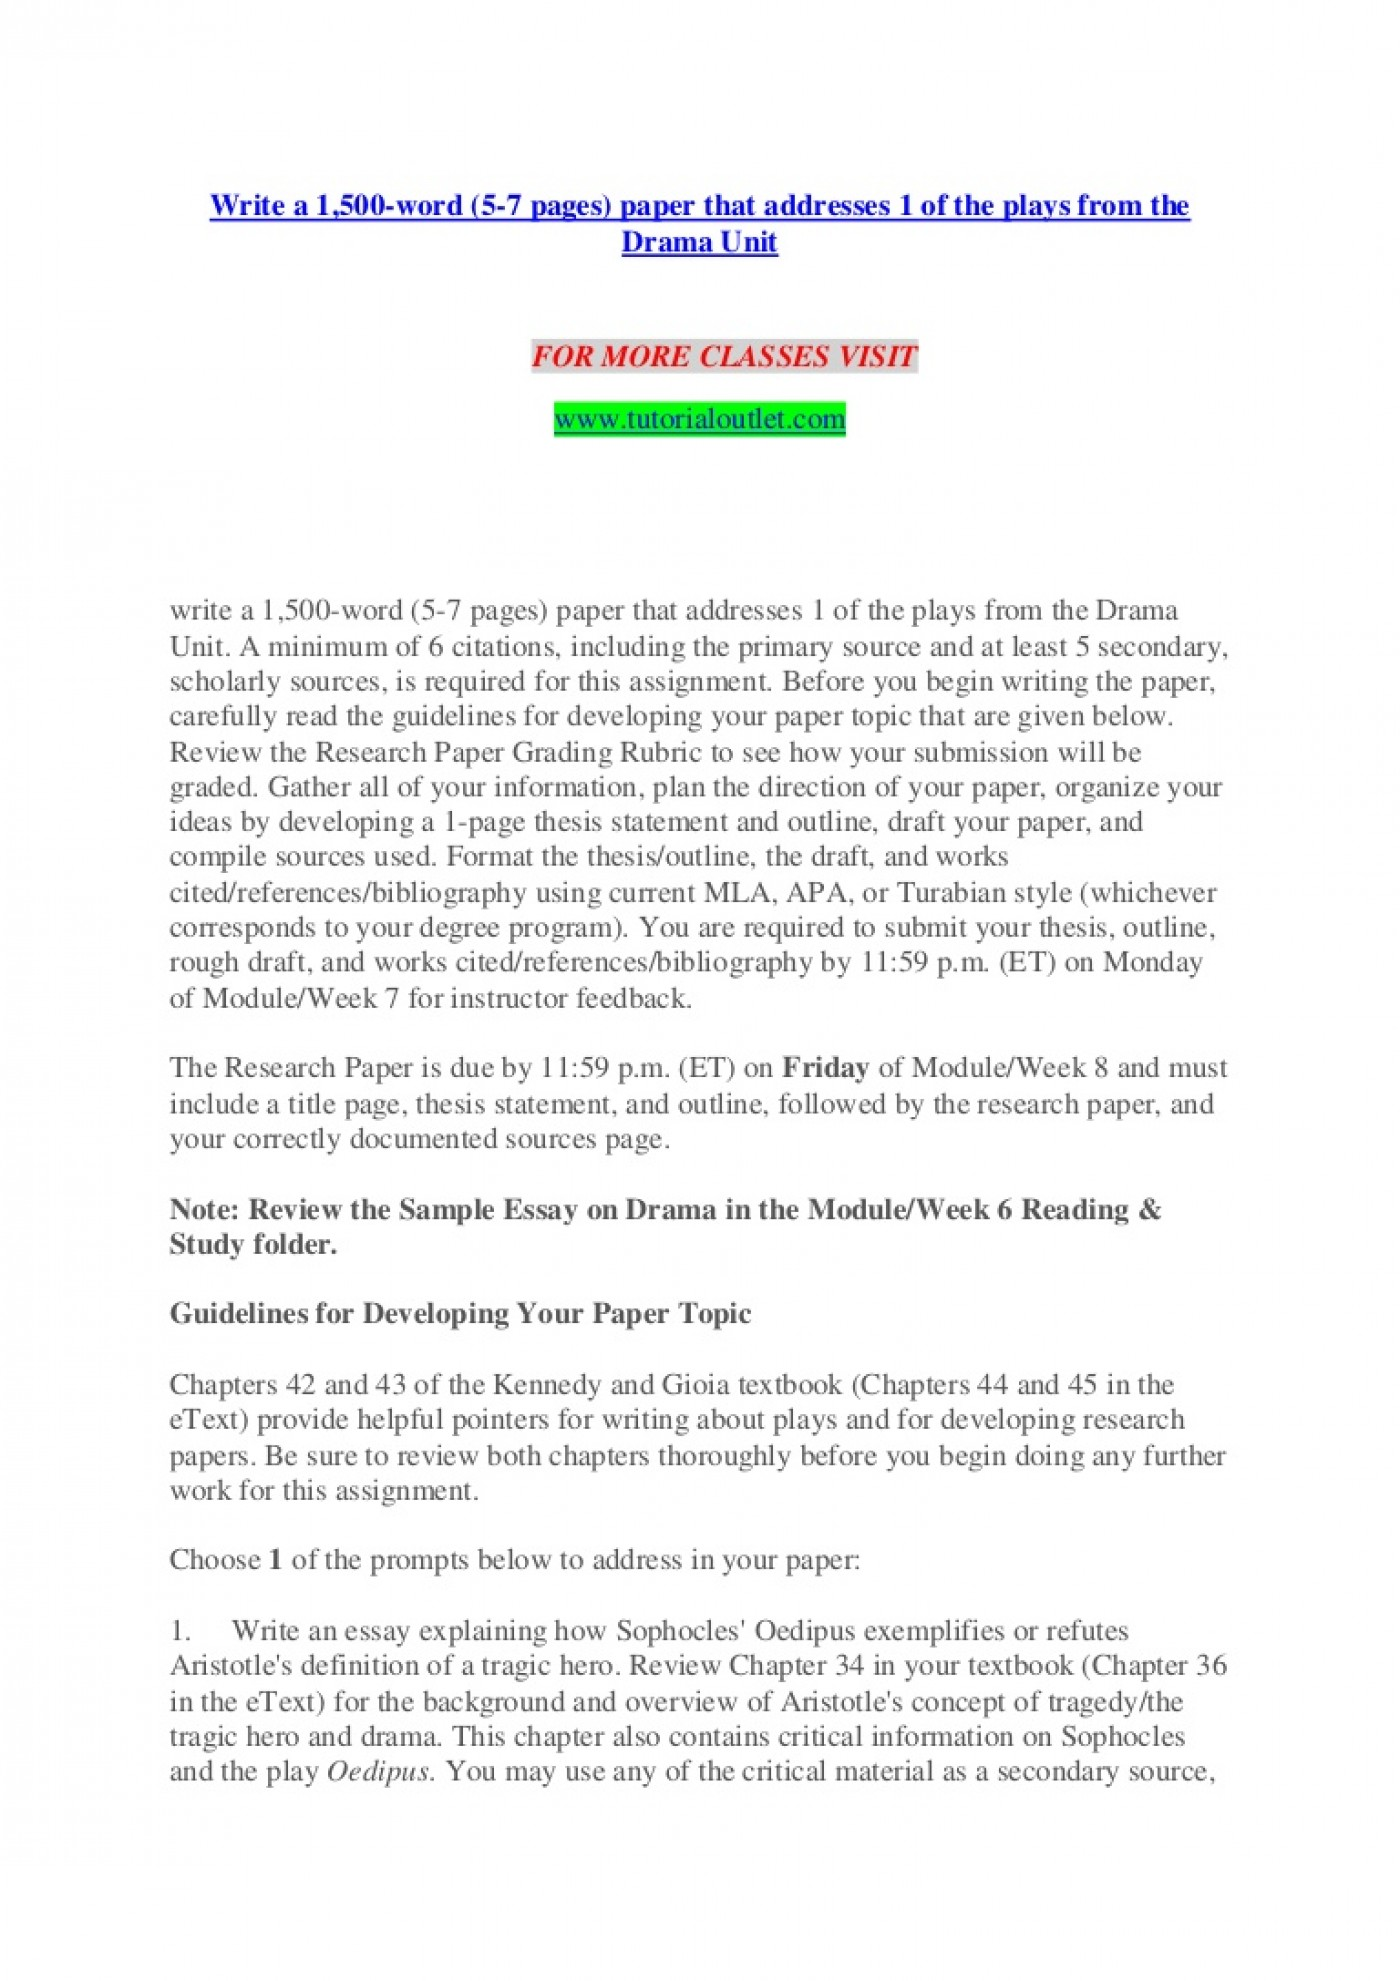 Nyu admission essay requirements